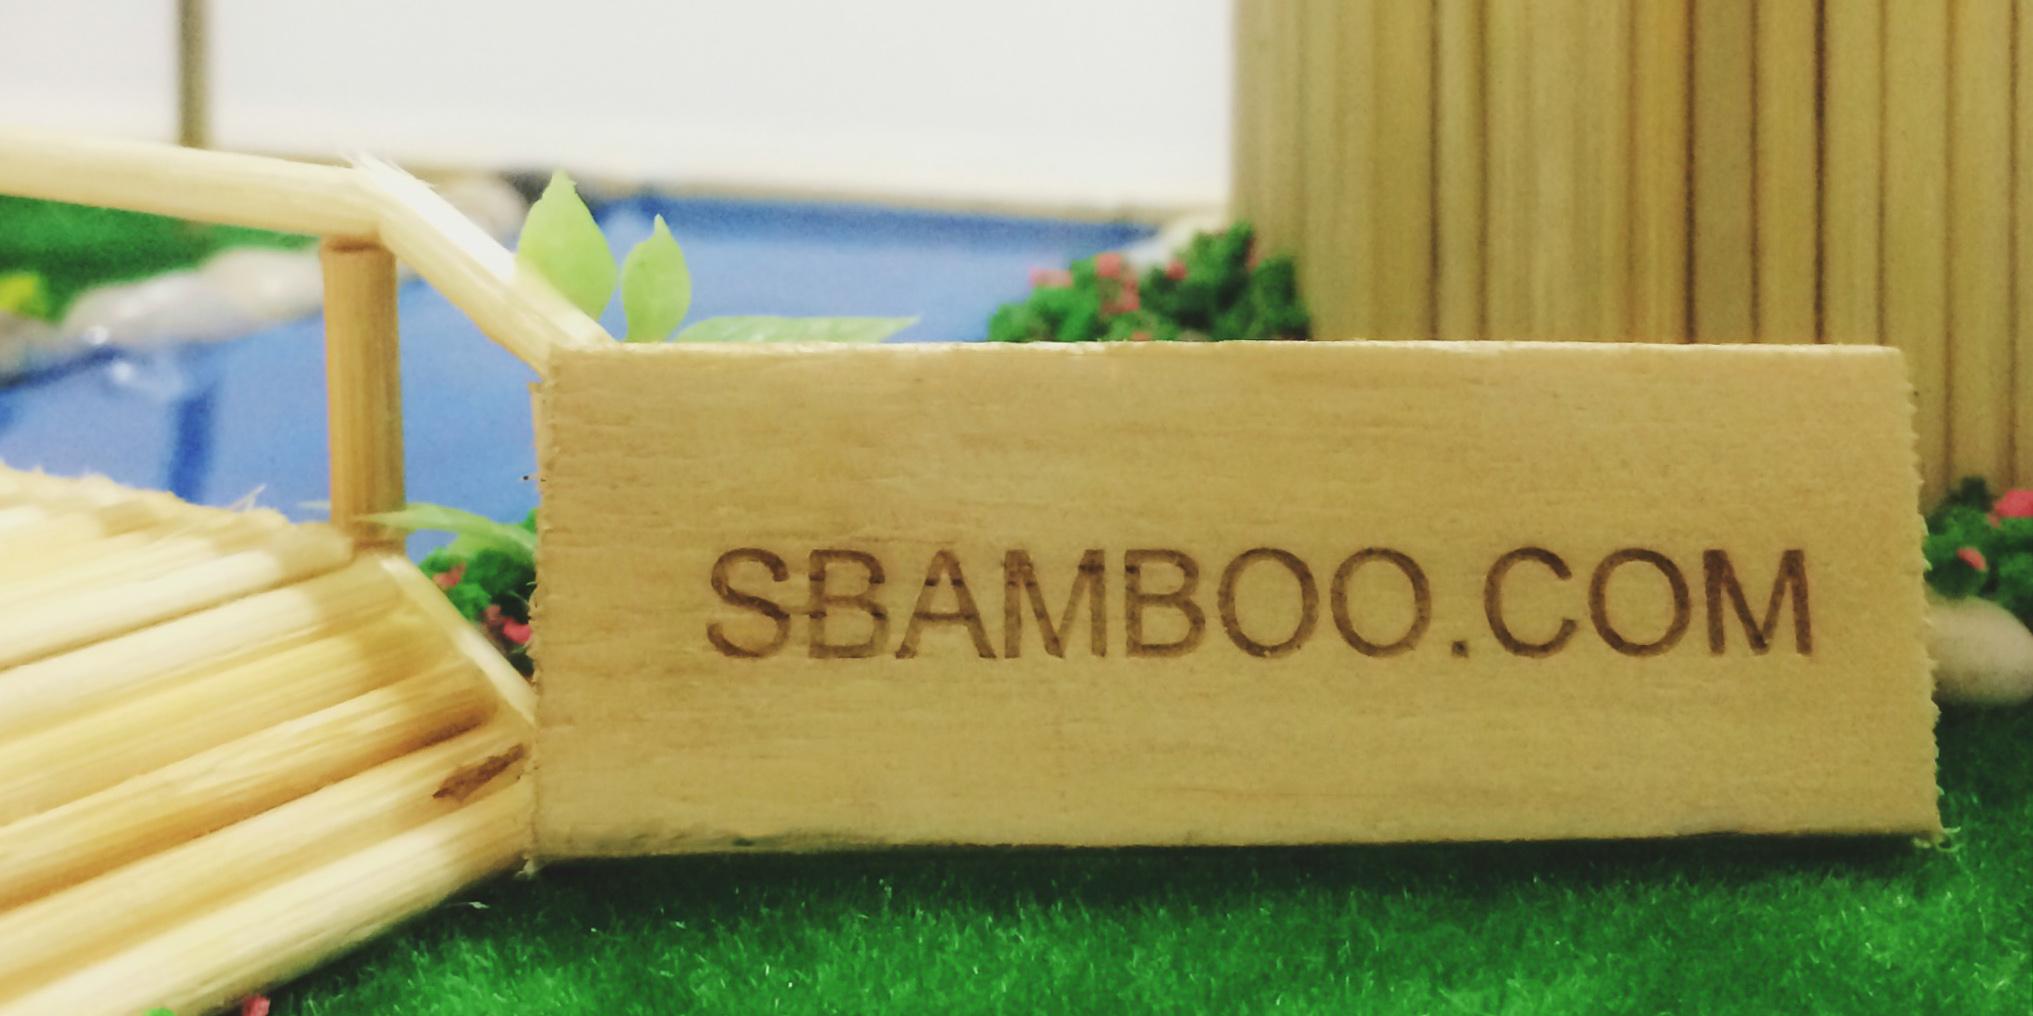 SBAMBOO_COM